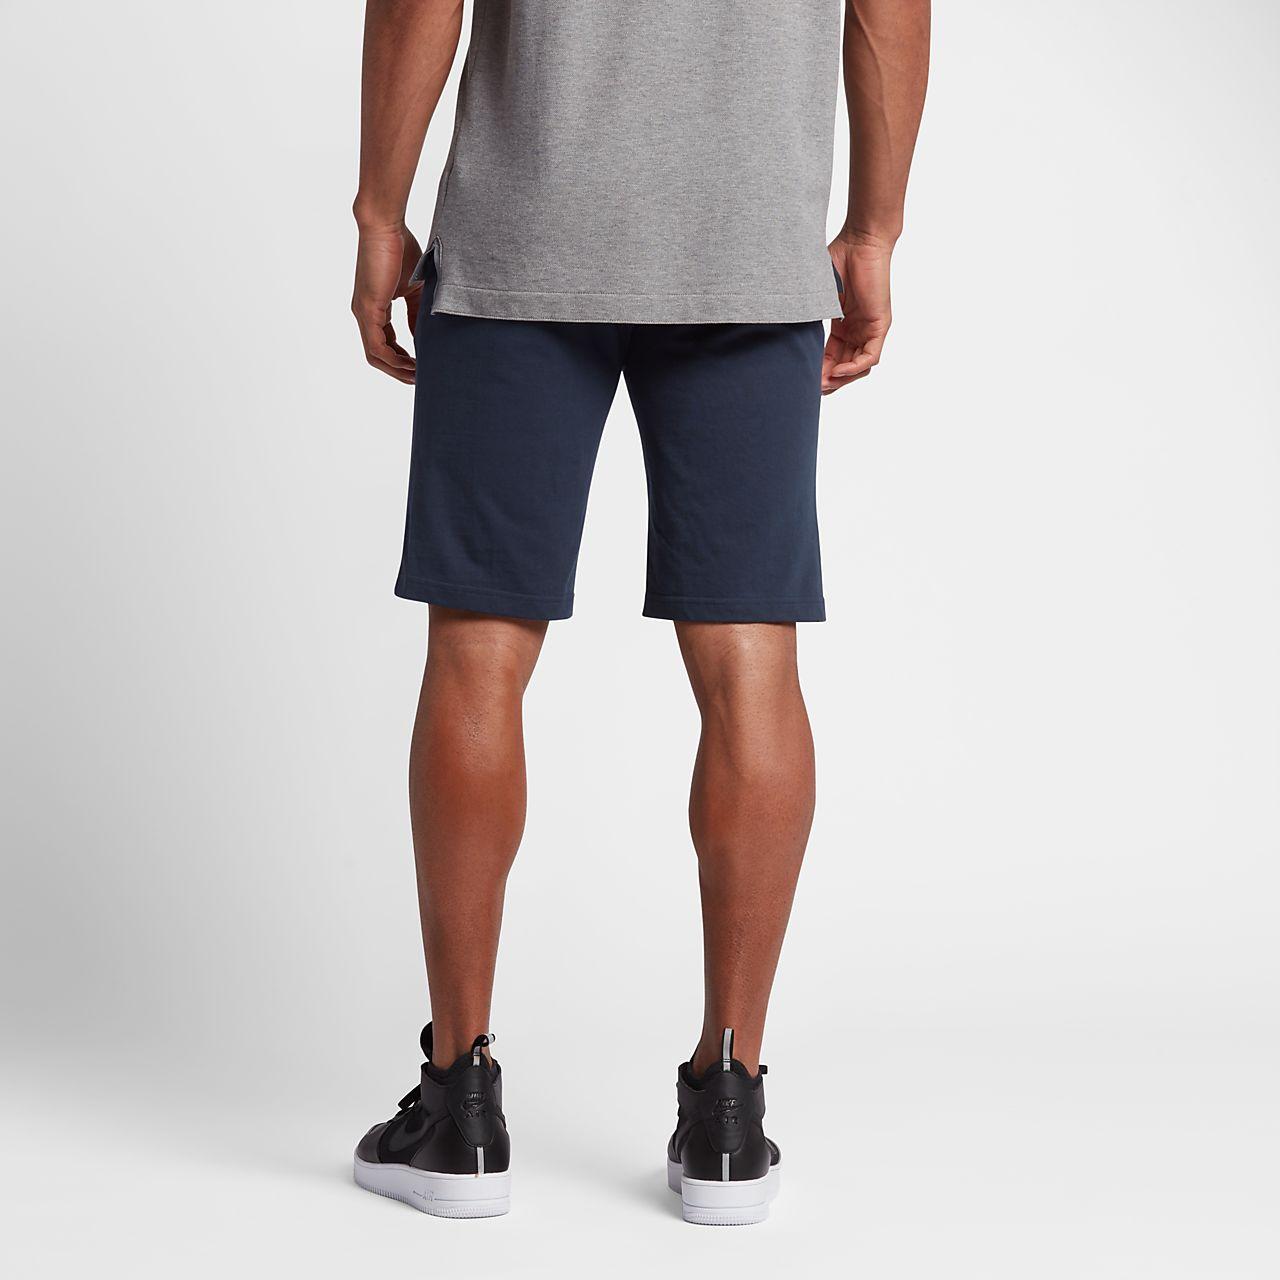 save off 312f4 fd0d2 Low Resolution Nike Sportswear Men s Shorts Nike Sportswear Men s Shorts